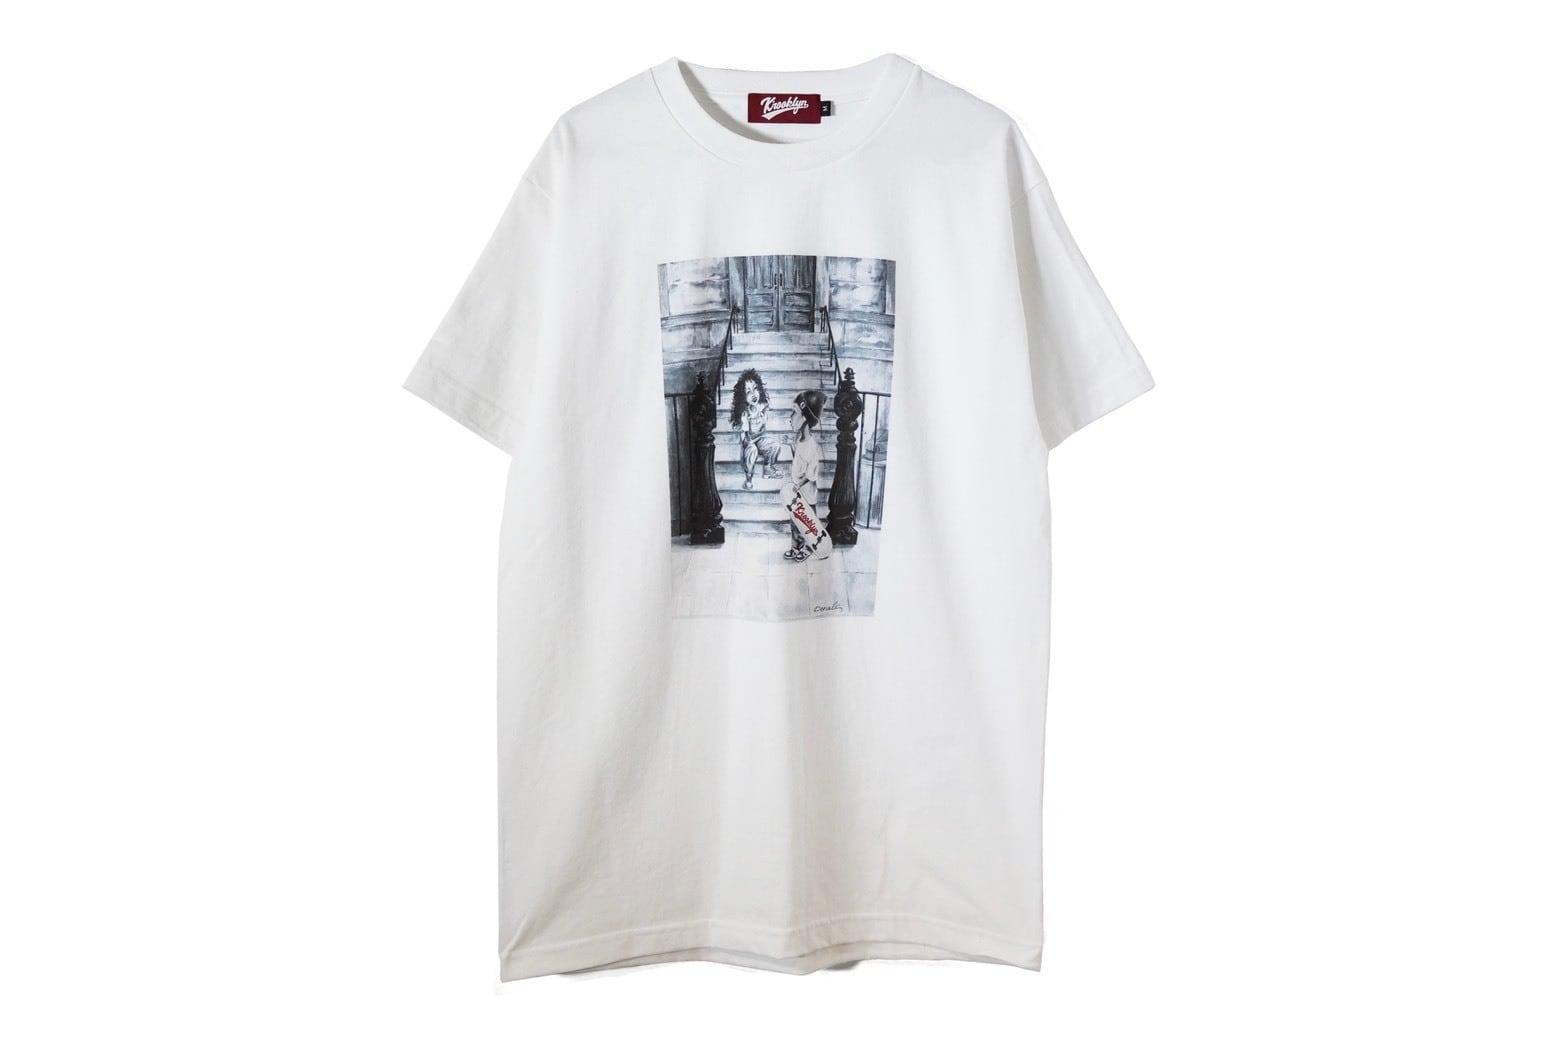 K'rooklyn × Denali  T-Shirts - White